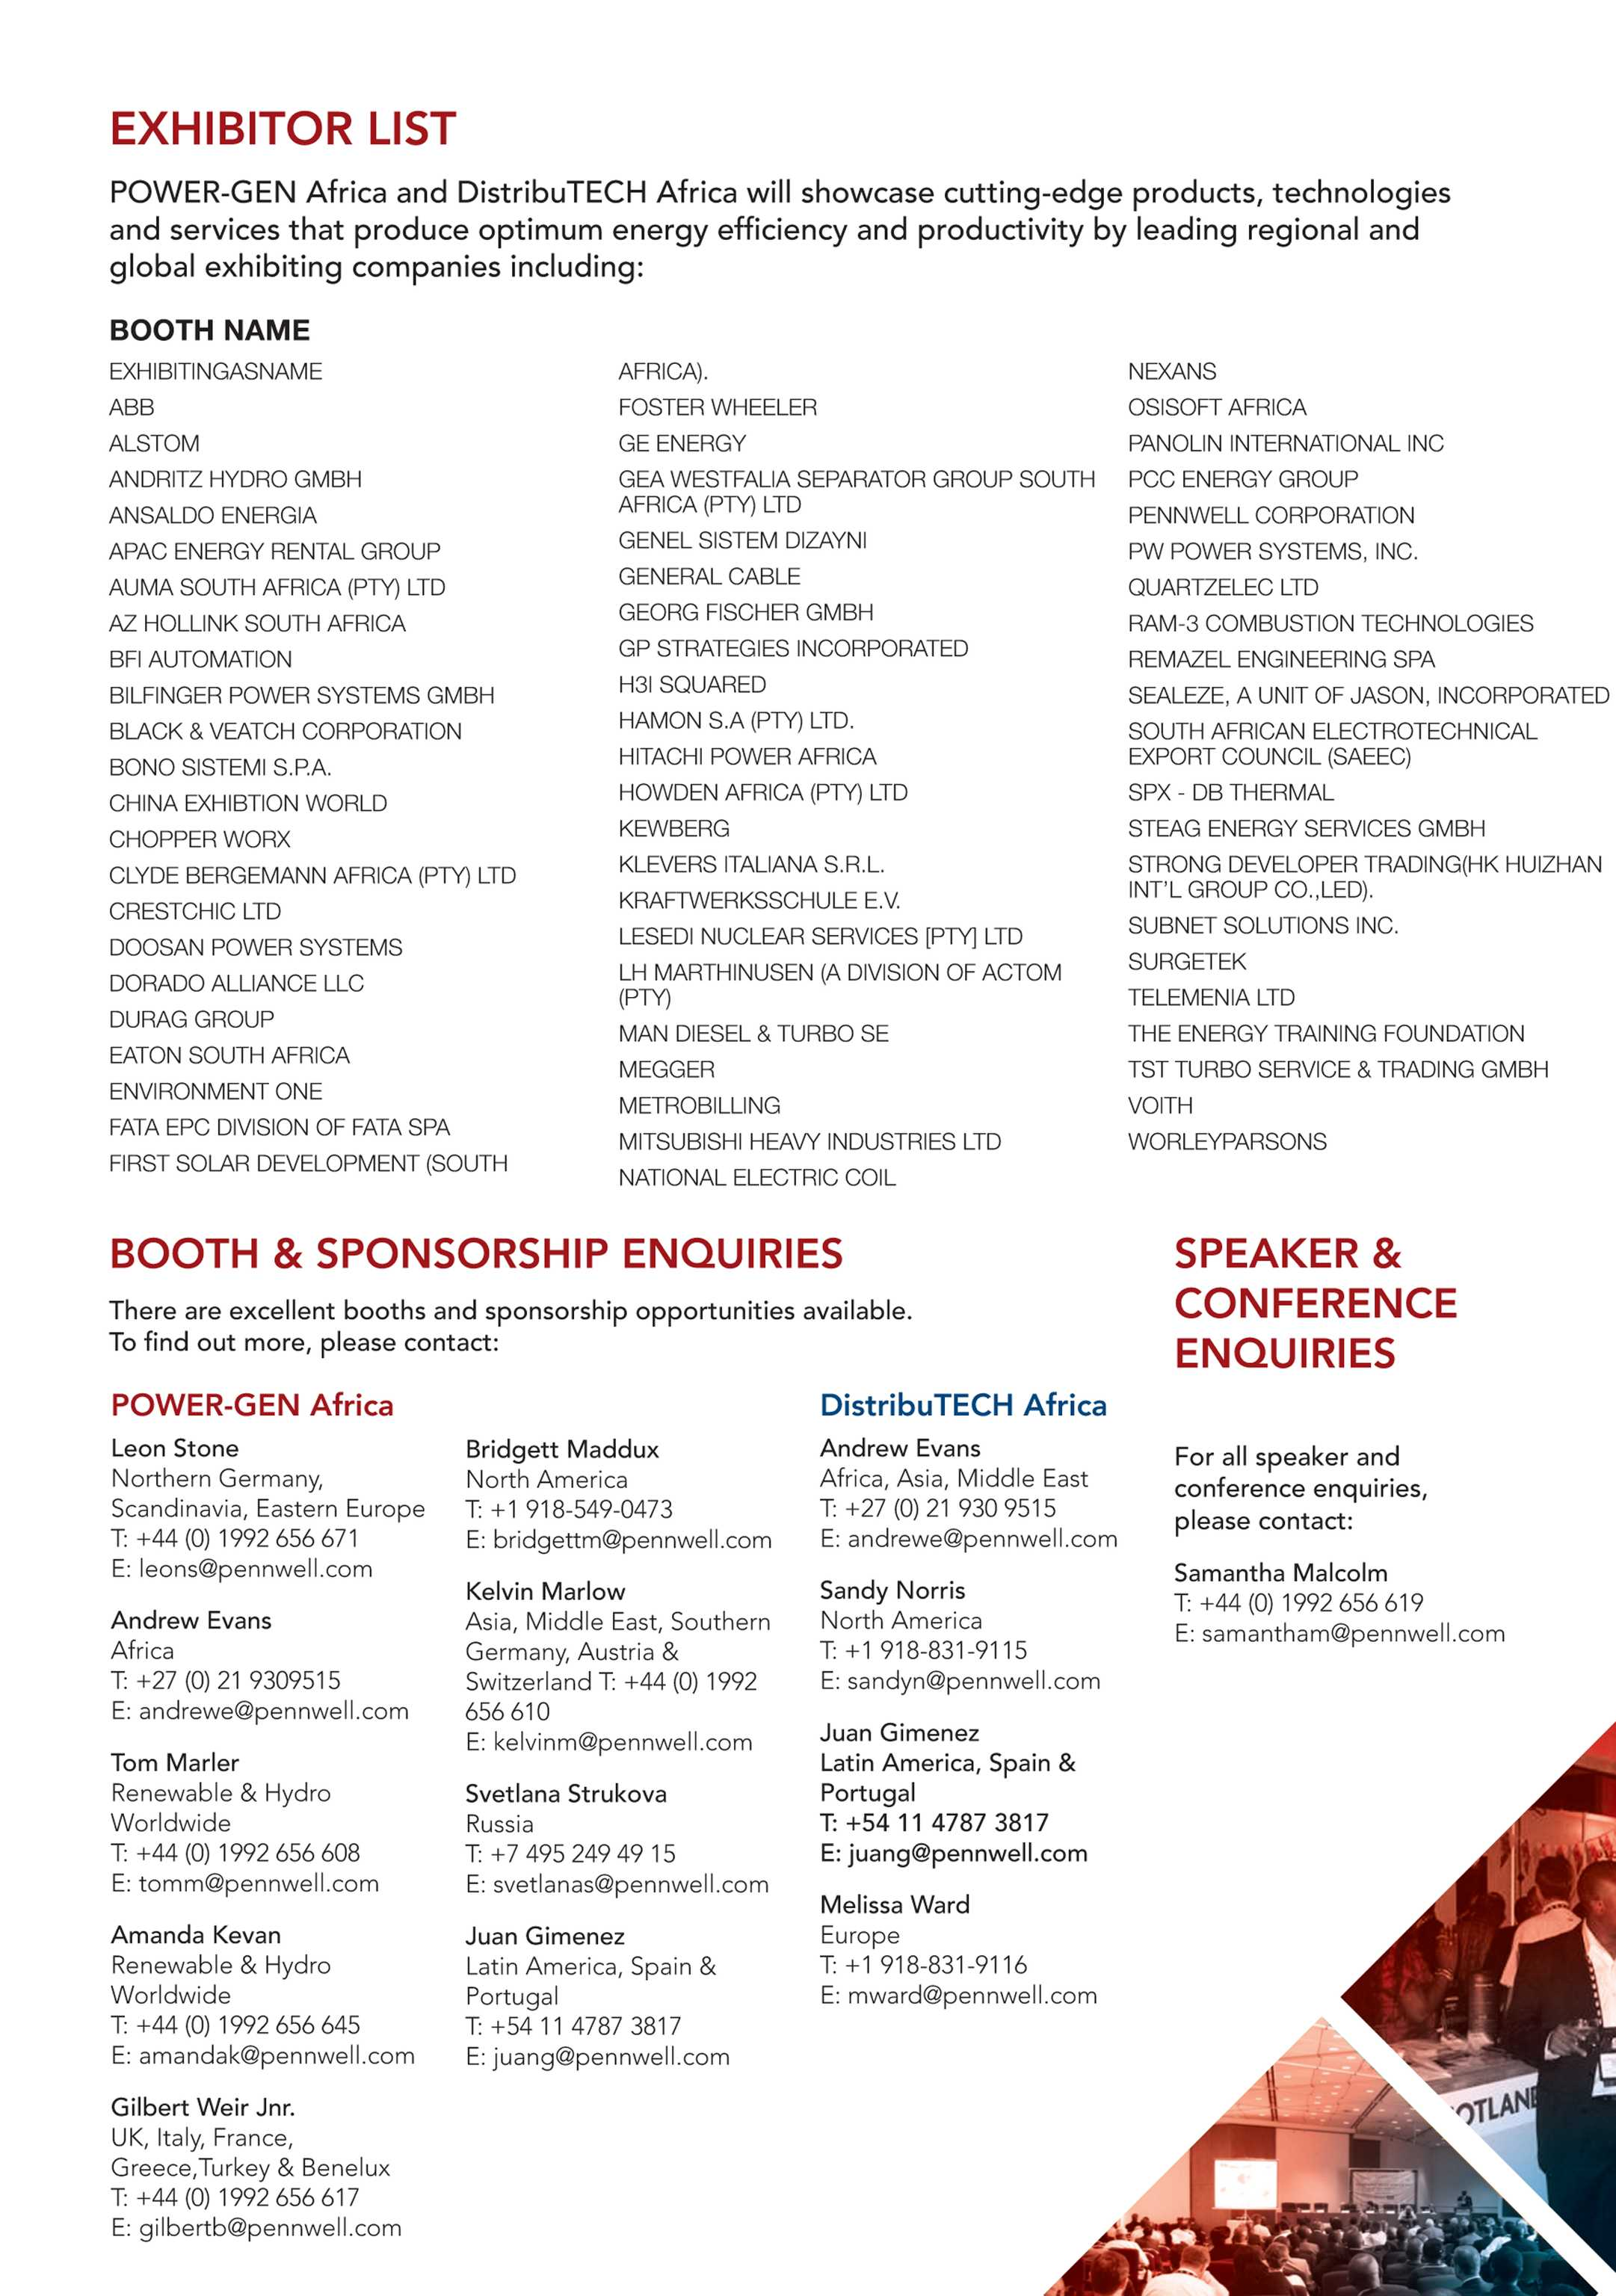 Pennwell Supplements - Power-Gen Distributech Africa 2014 - page 11